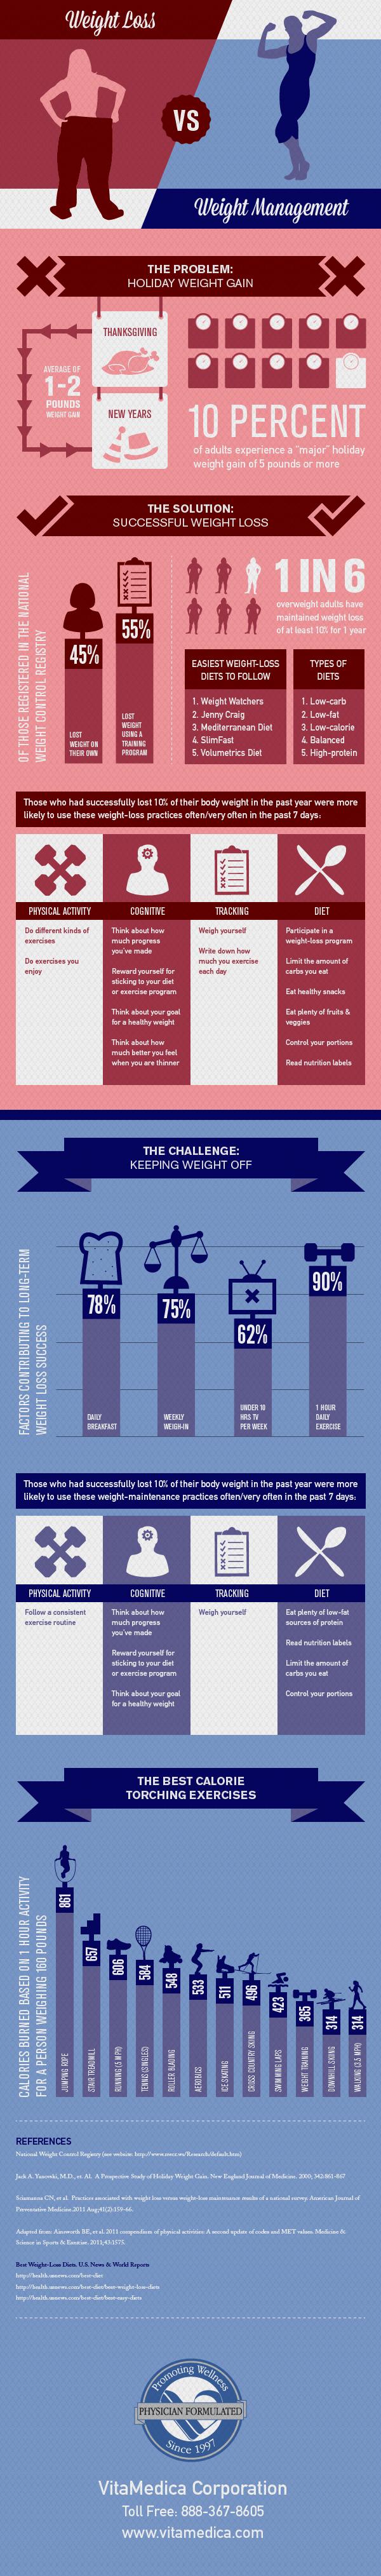 weight-loss-versus-weight-management_50eb6dff8b794